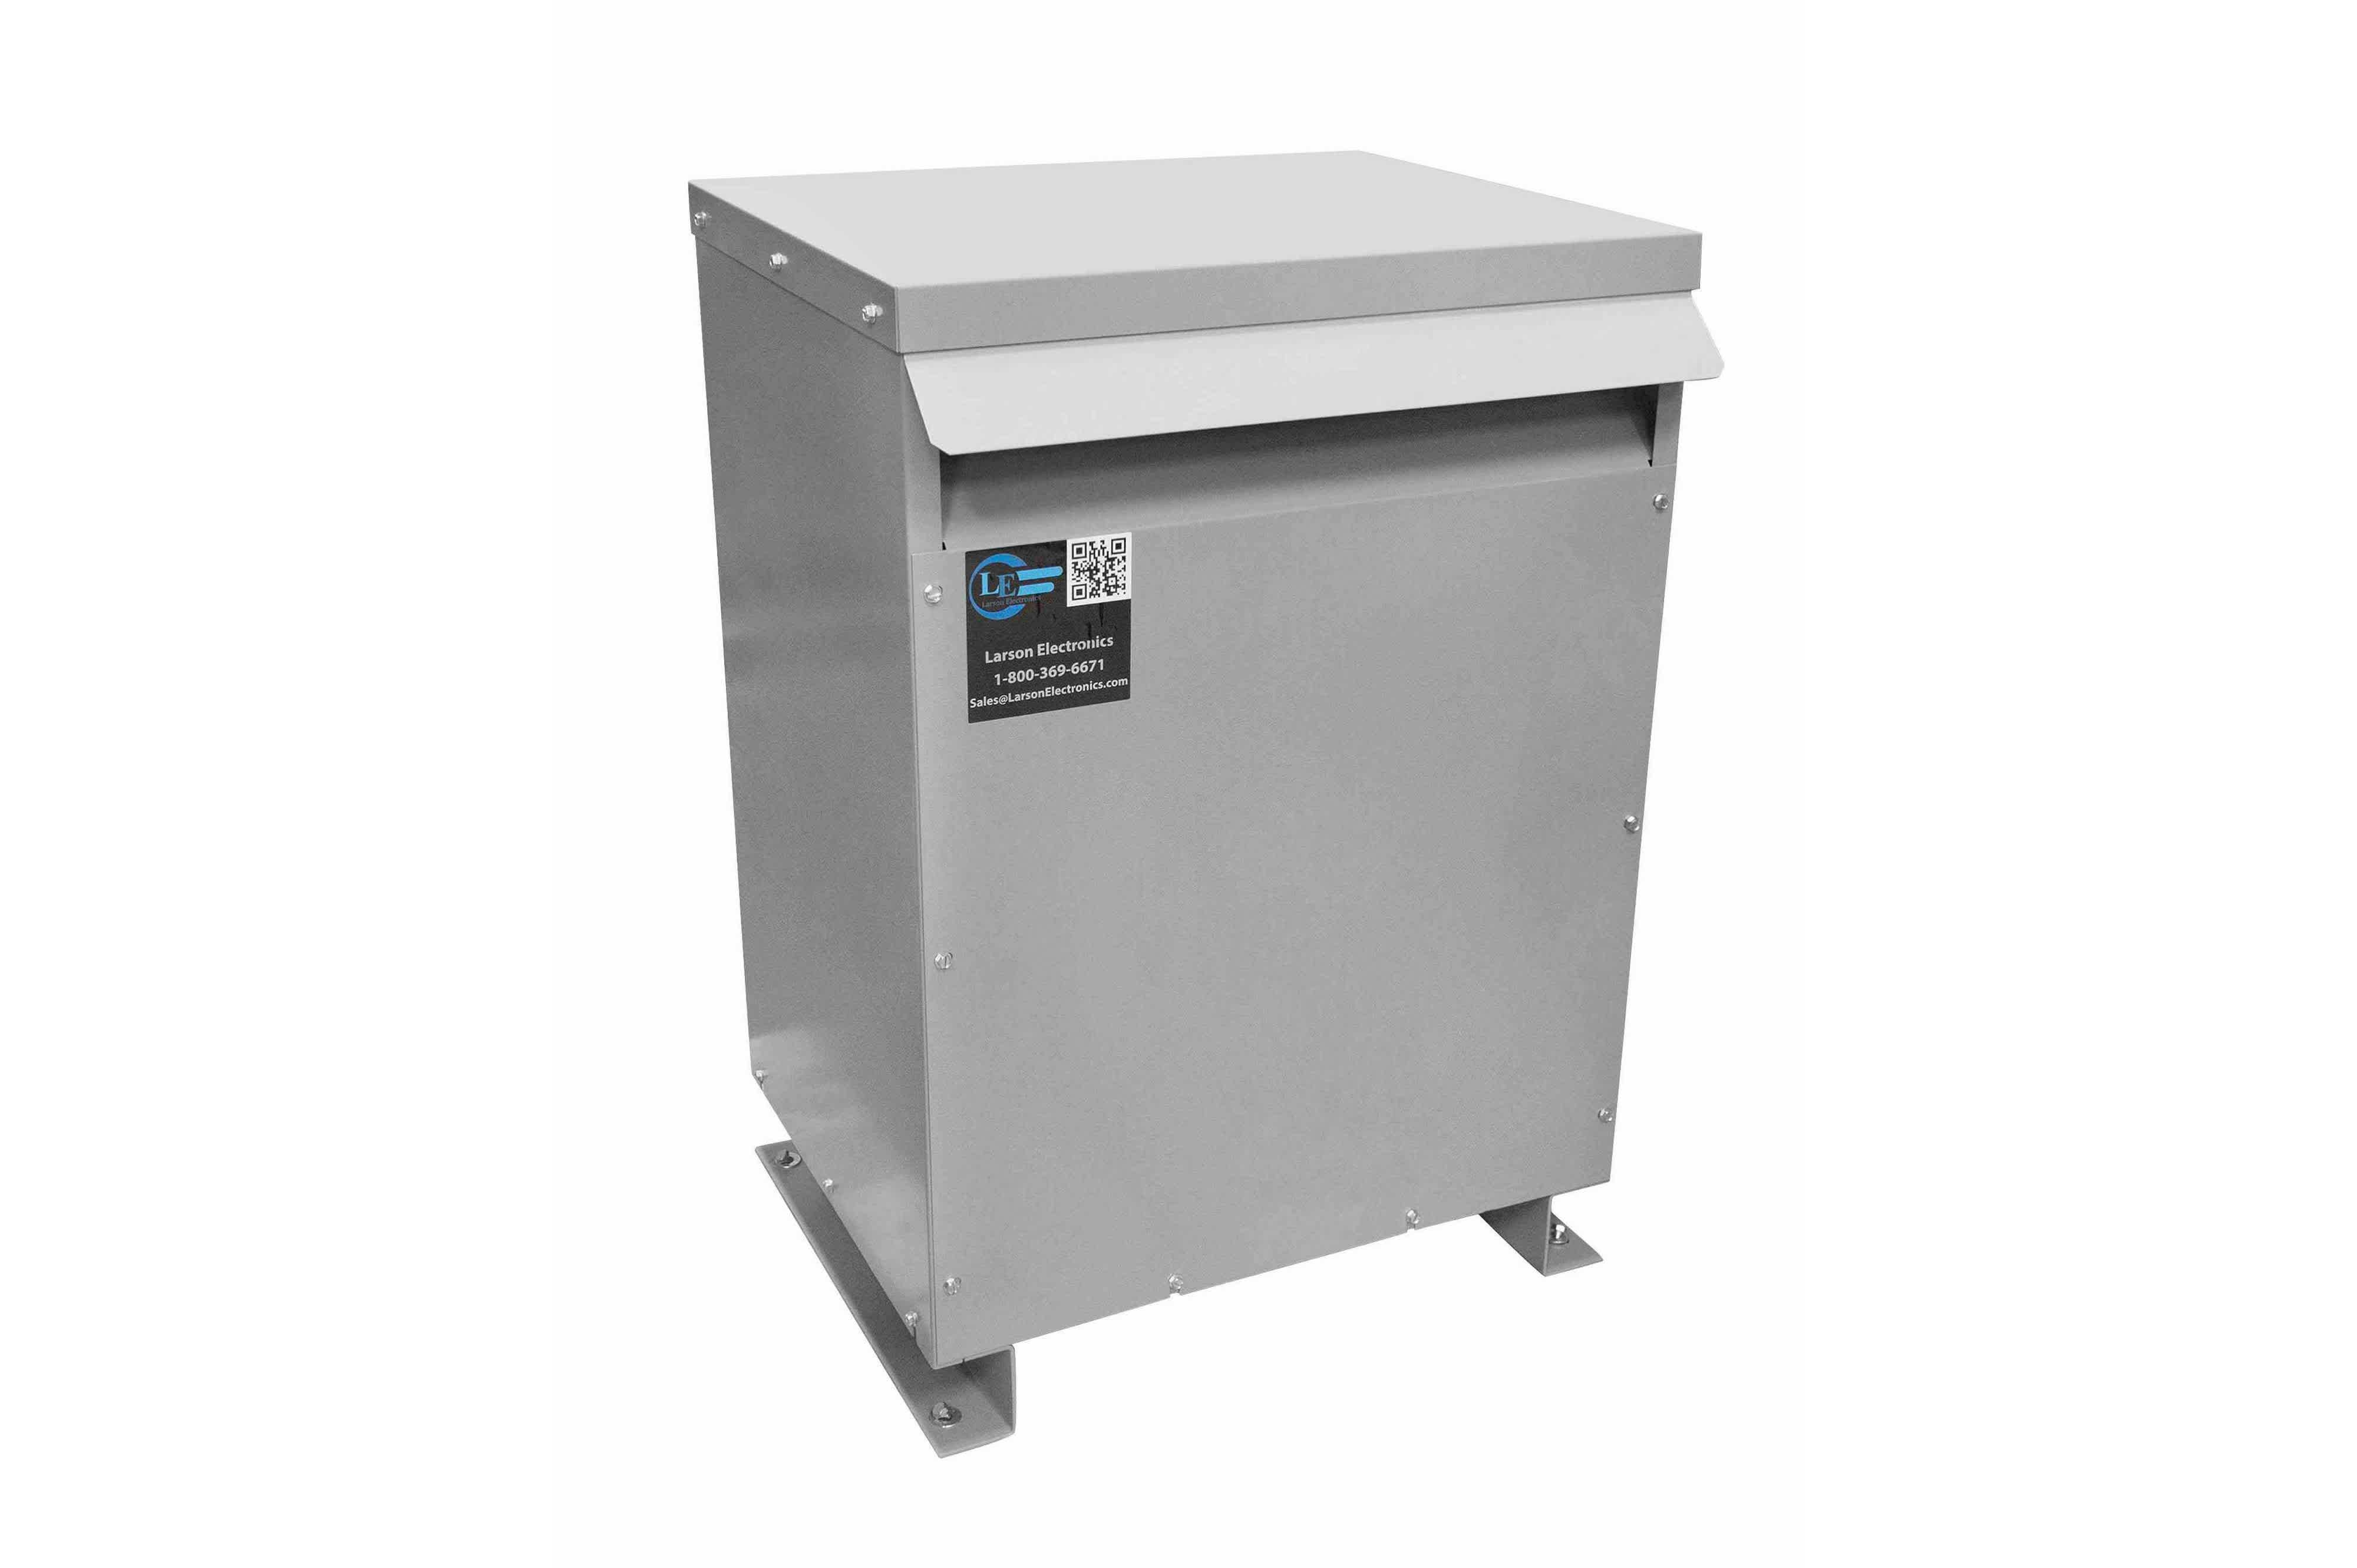 900 kVA 3PH Isolation Transformer, 575V Wye Primary, 208Y/120 Wye-N Secondary, N3R, Ventilated, 60 Hz